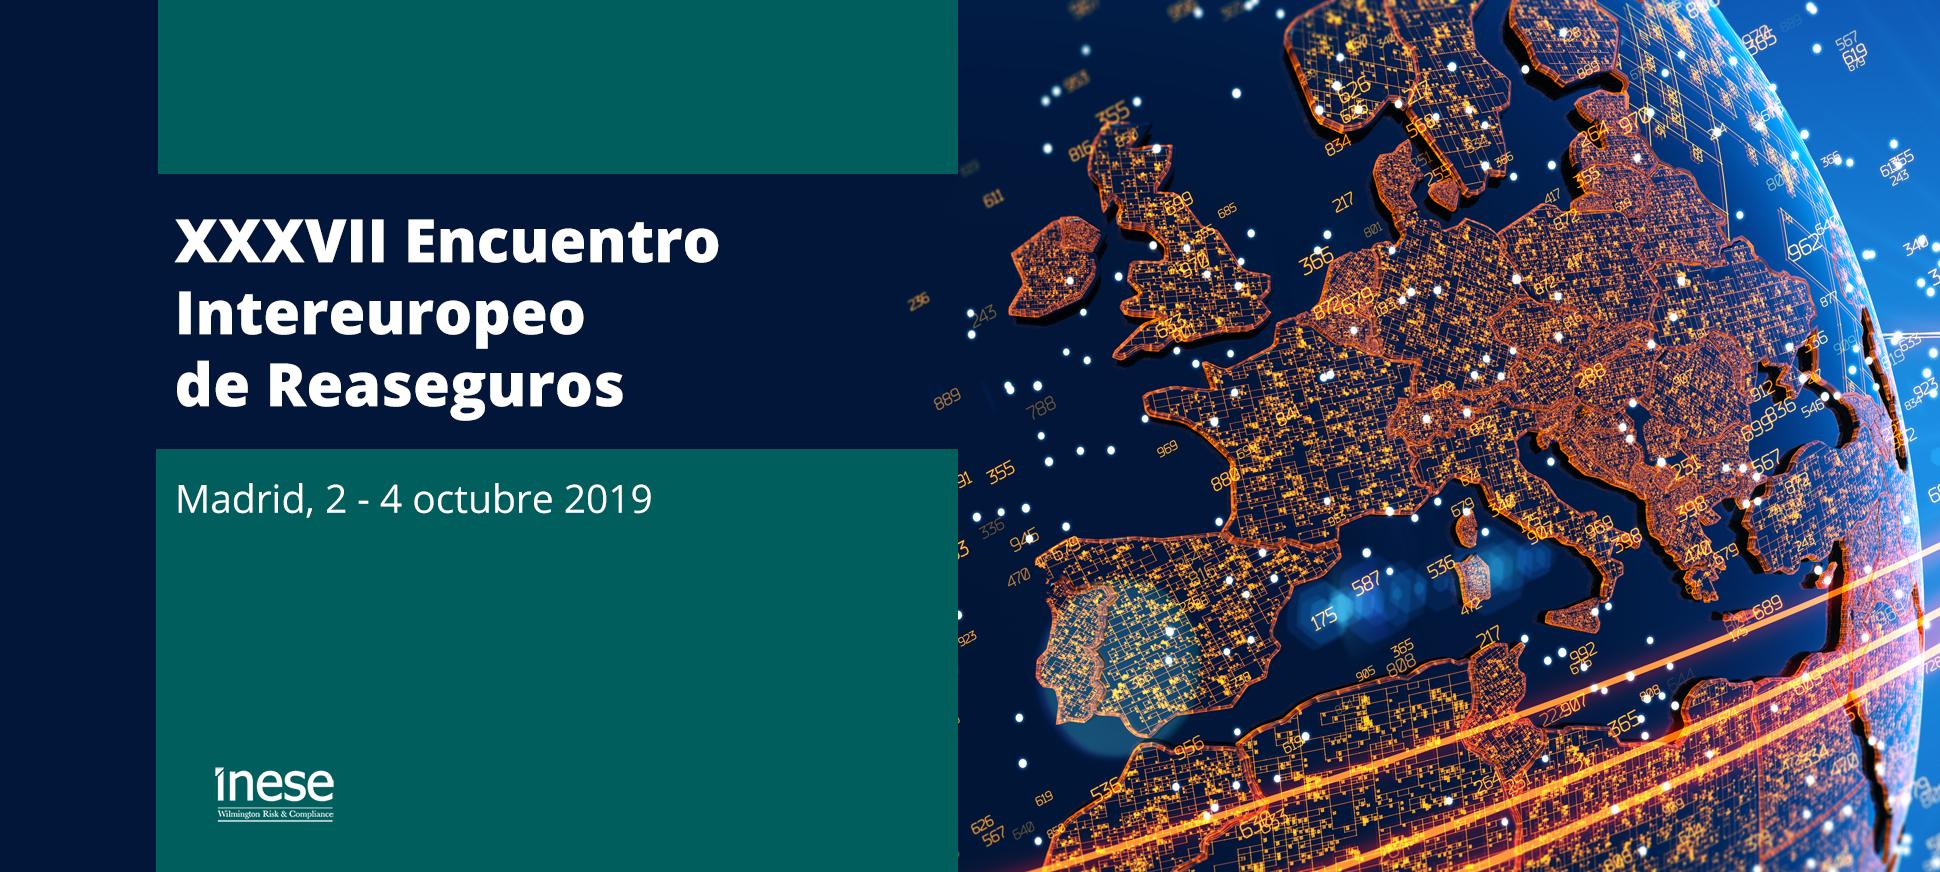 XXXVII Encuentro Intereuropeo de Reaseguros